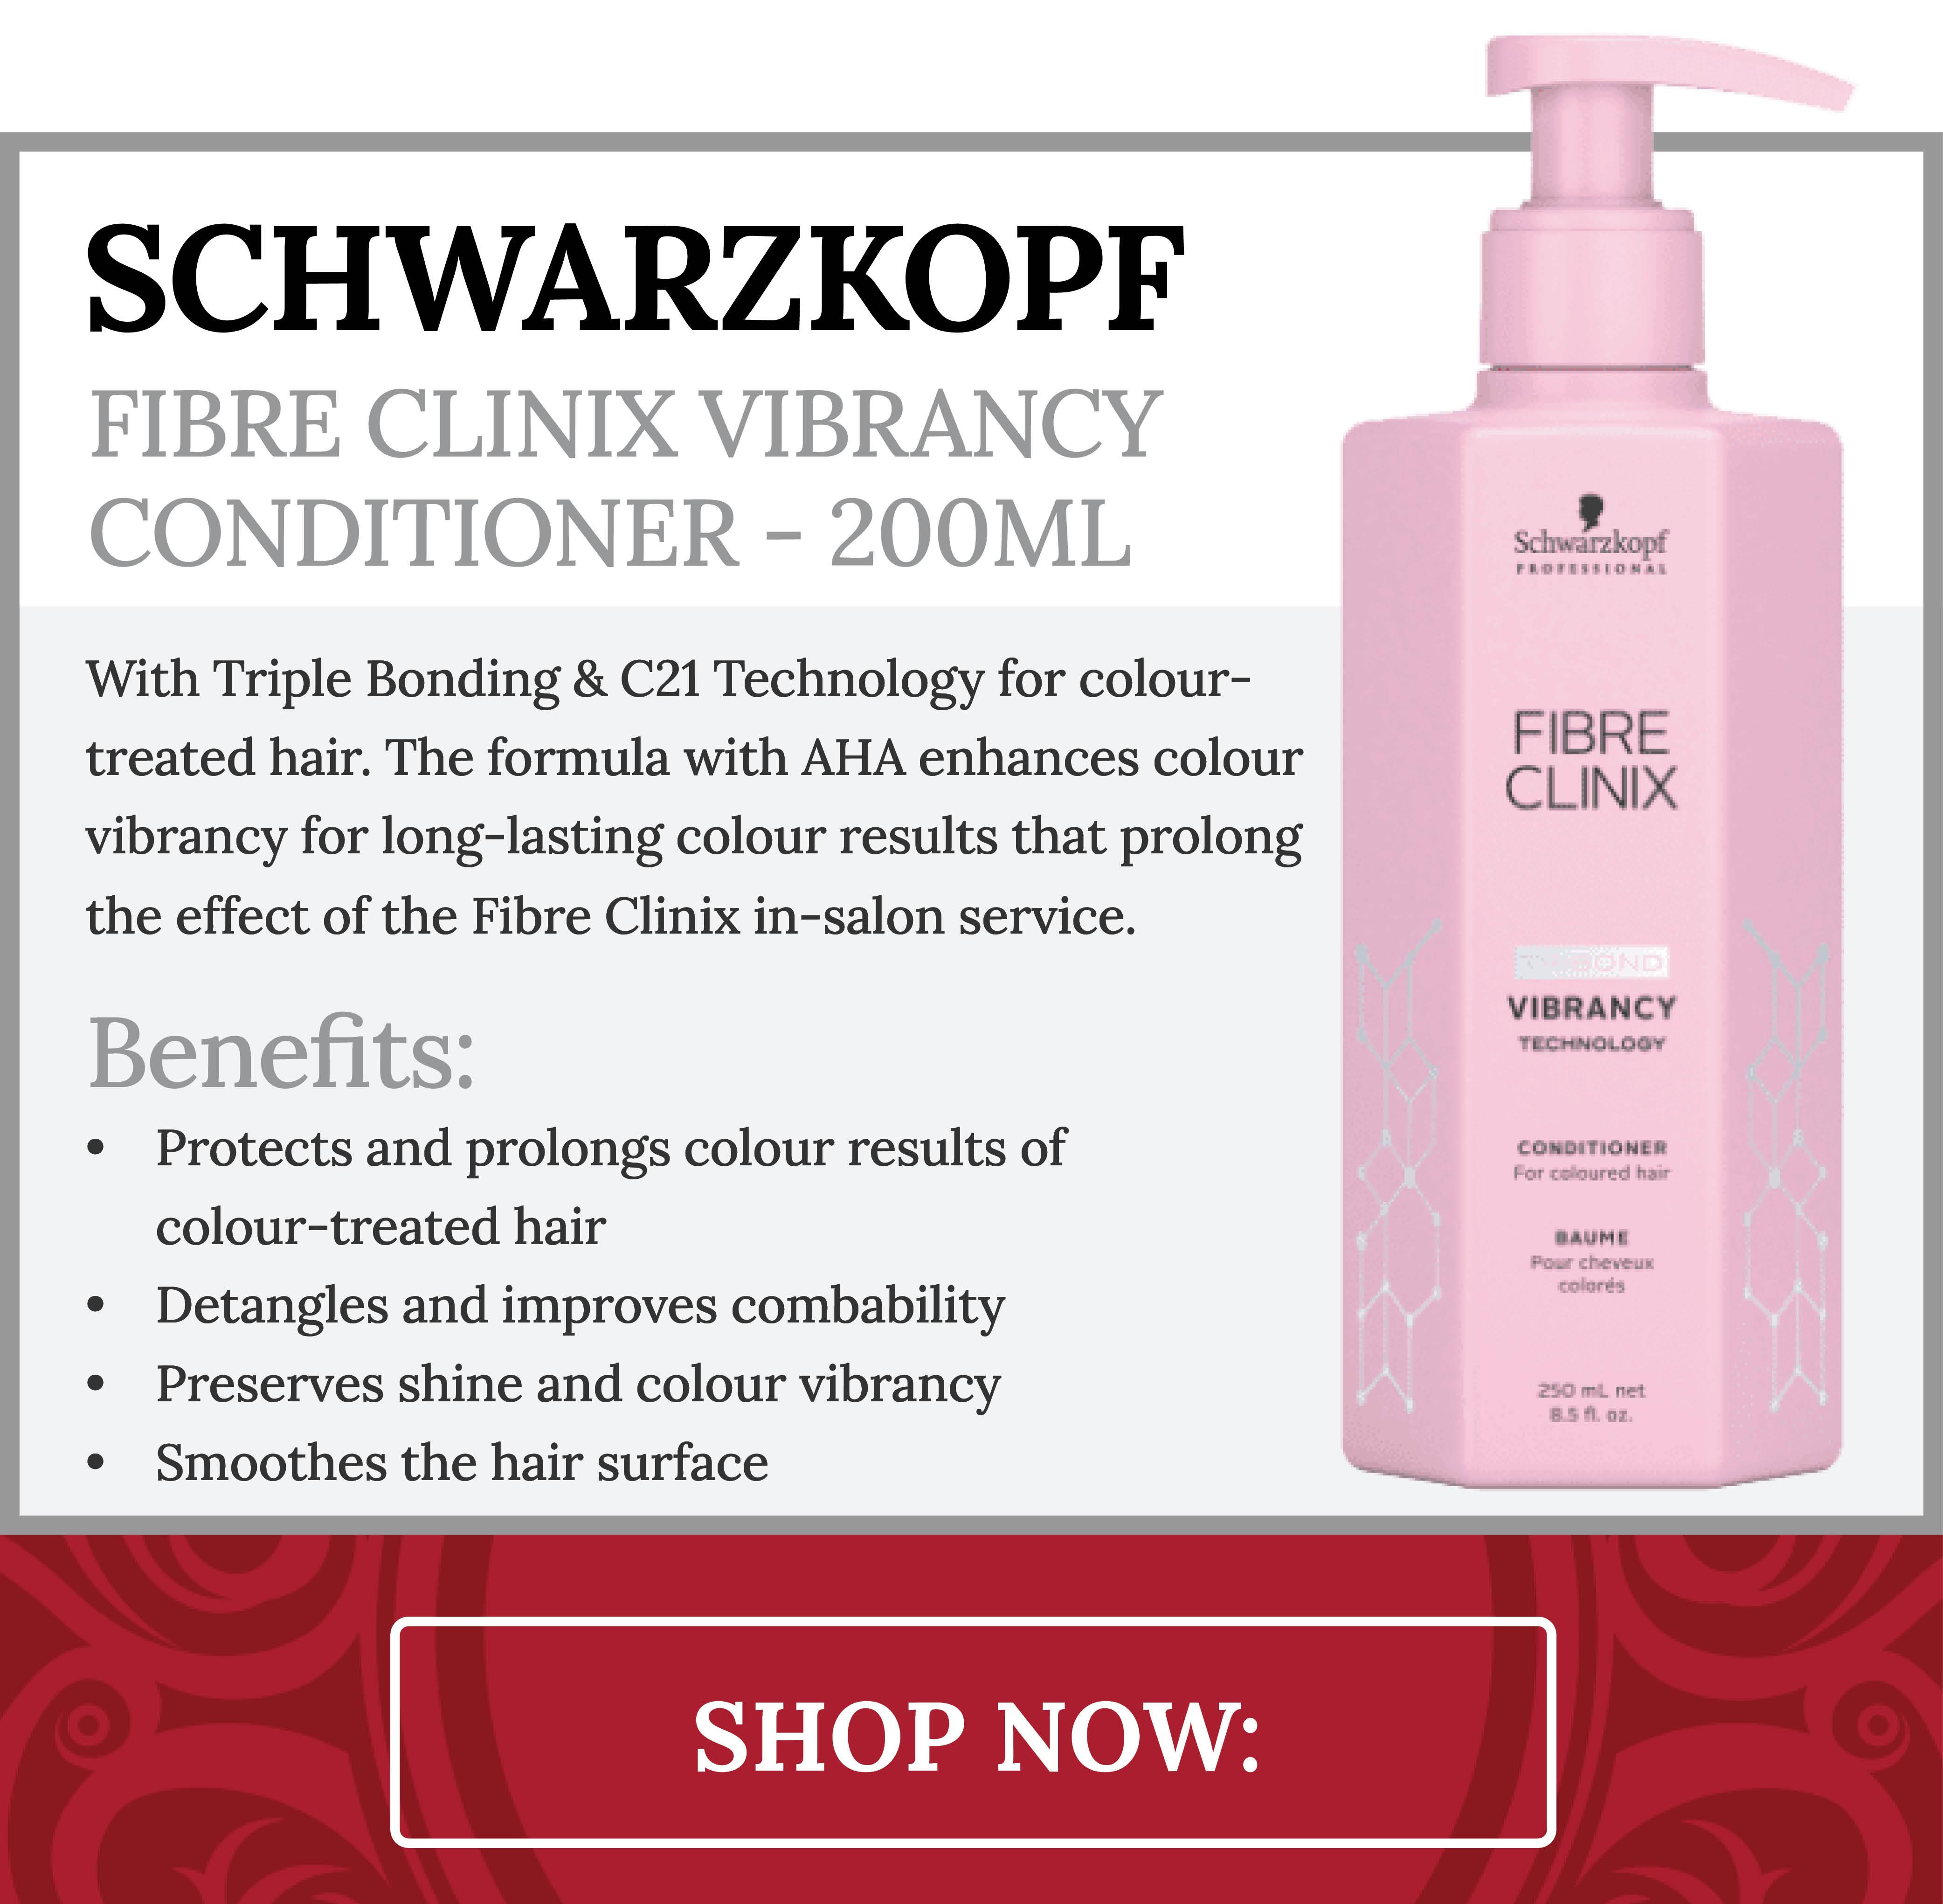 https://shop.vforhair.co.nz/products/schwarzkopf-fibre-clinix-vibrancy-conditioner-200ml?_pos=2&_sid=57a1115d5&_ss=r